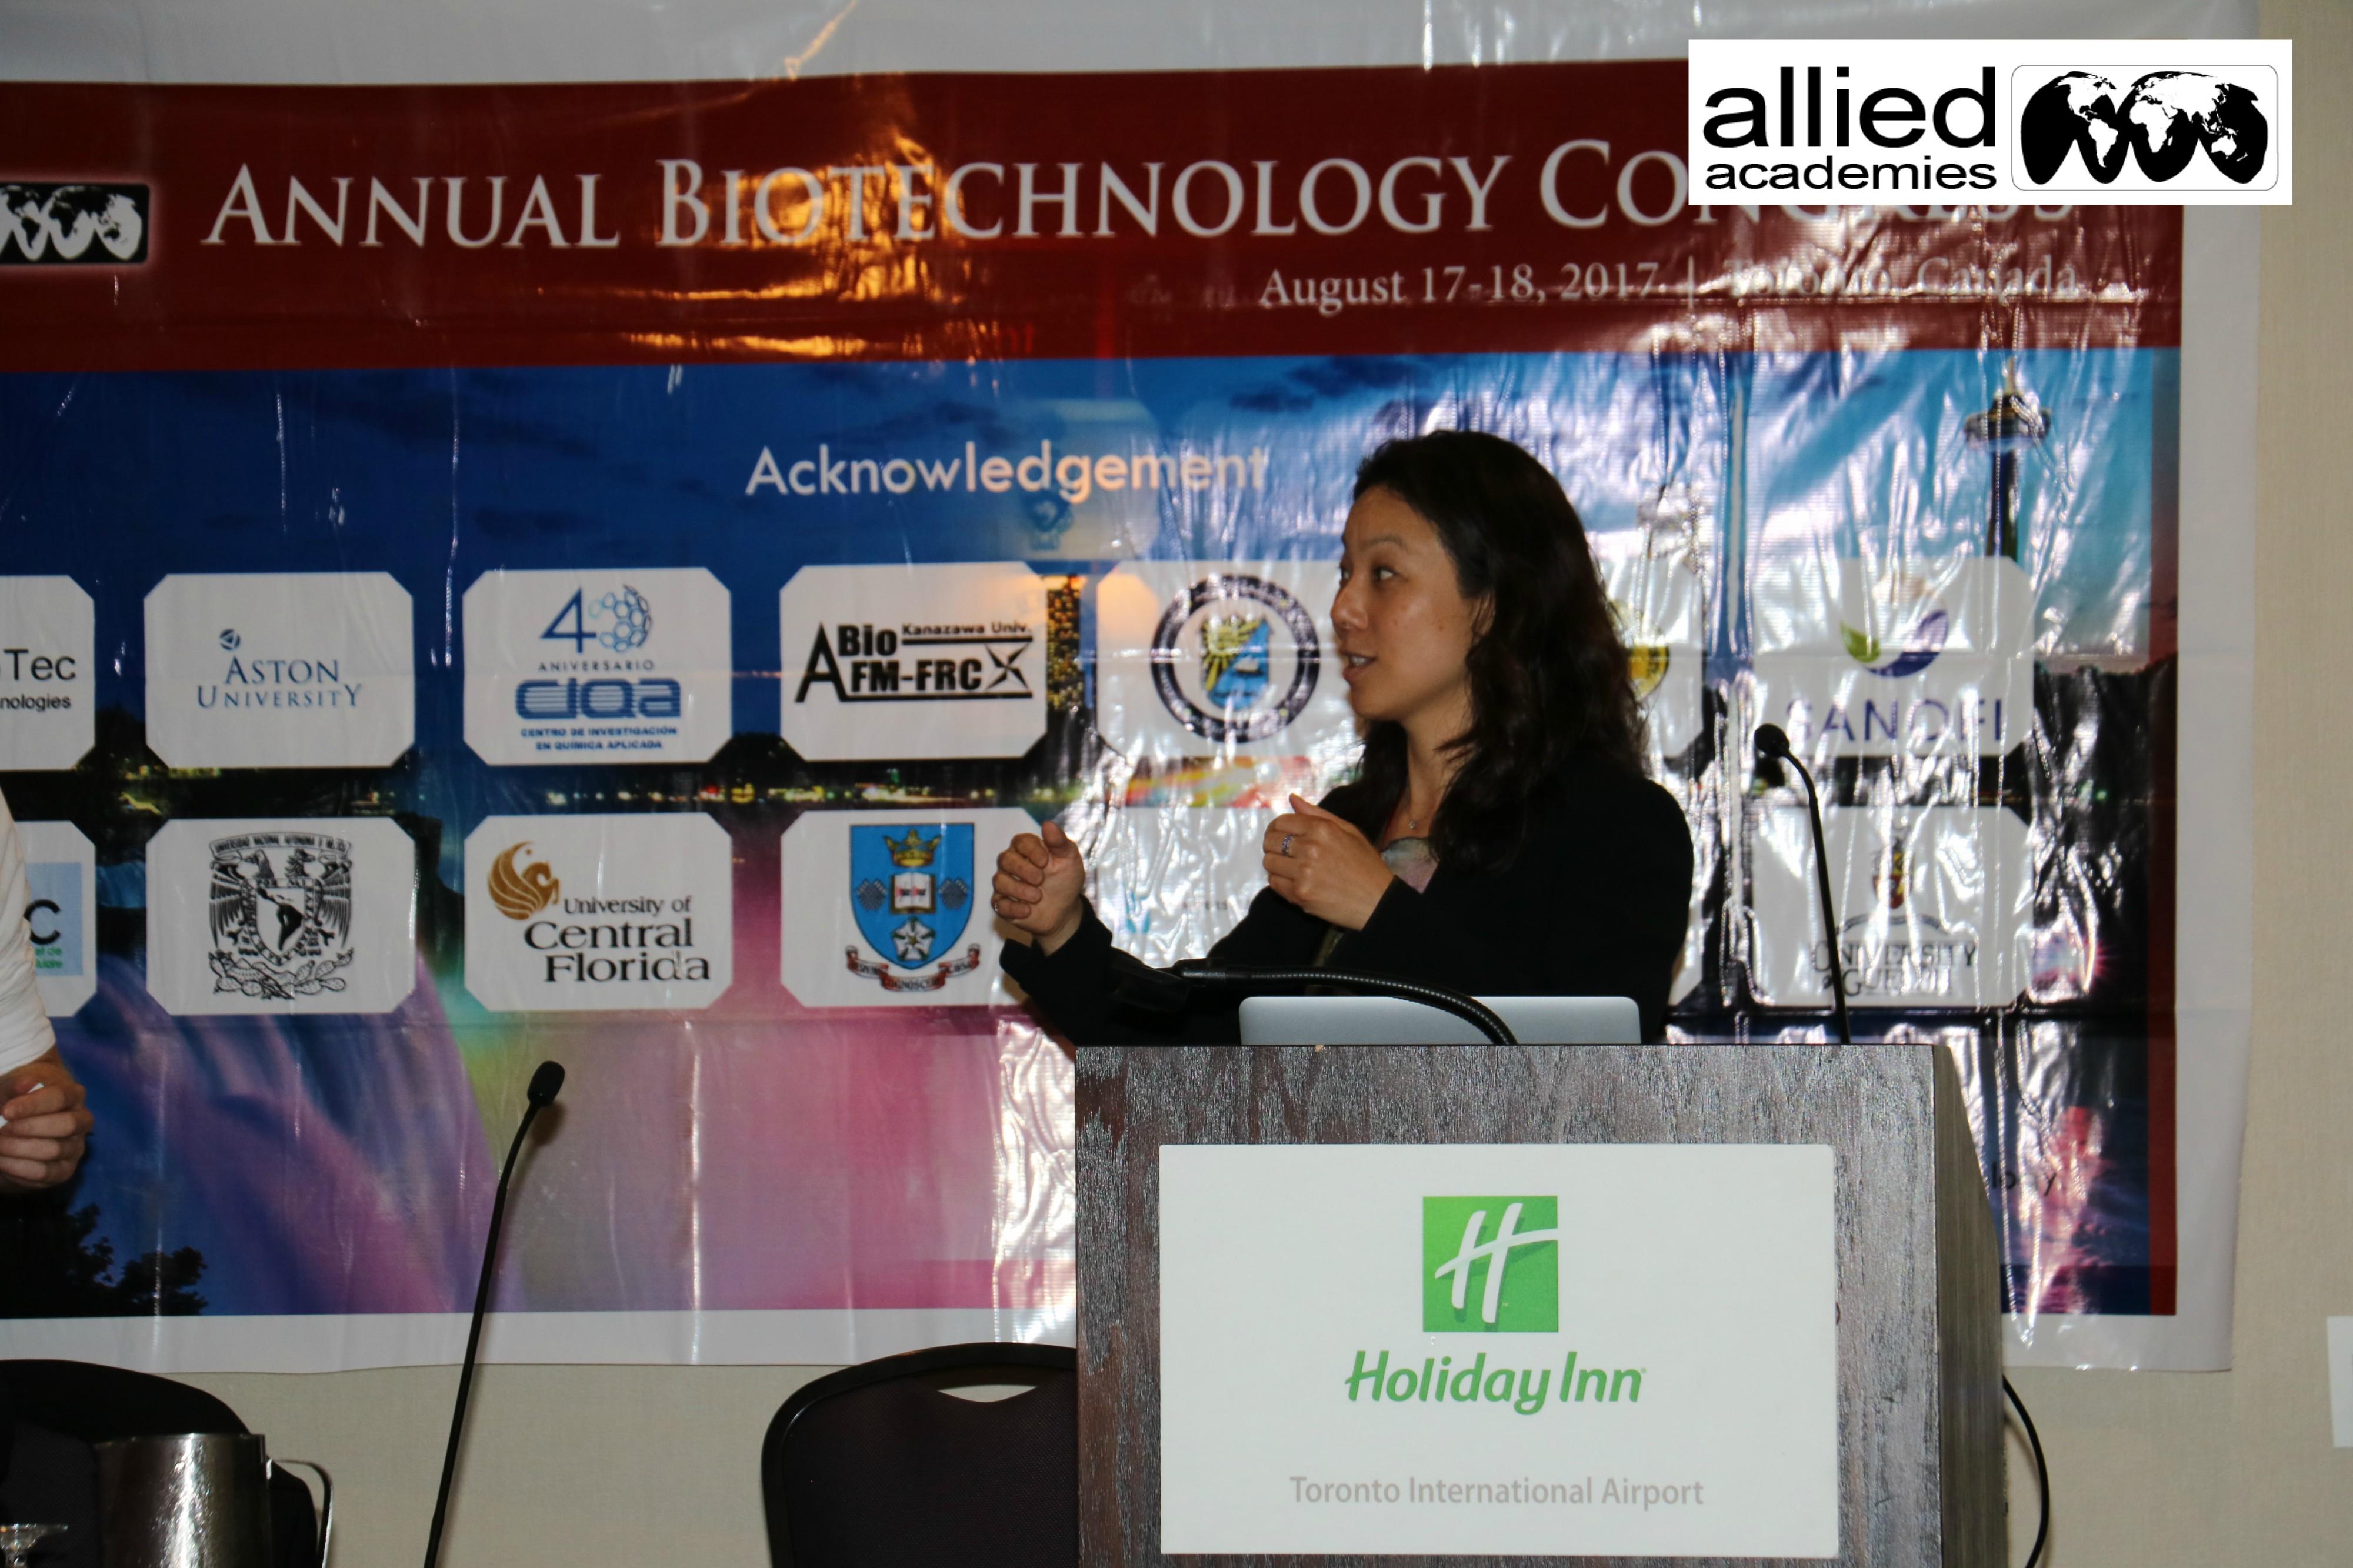 Biotechnology 2017 Photos